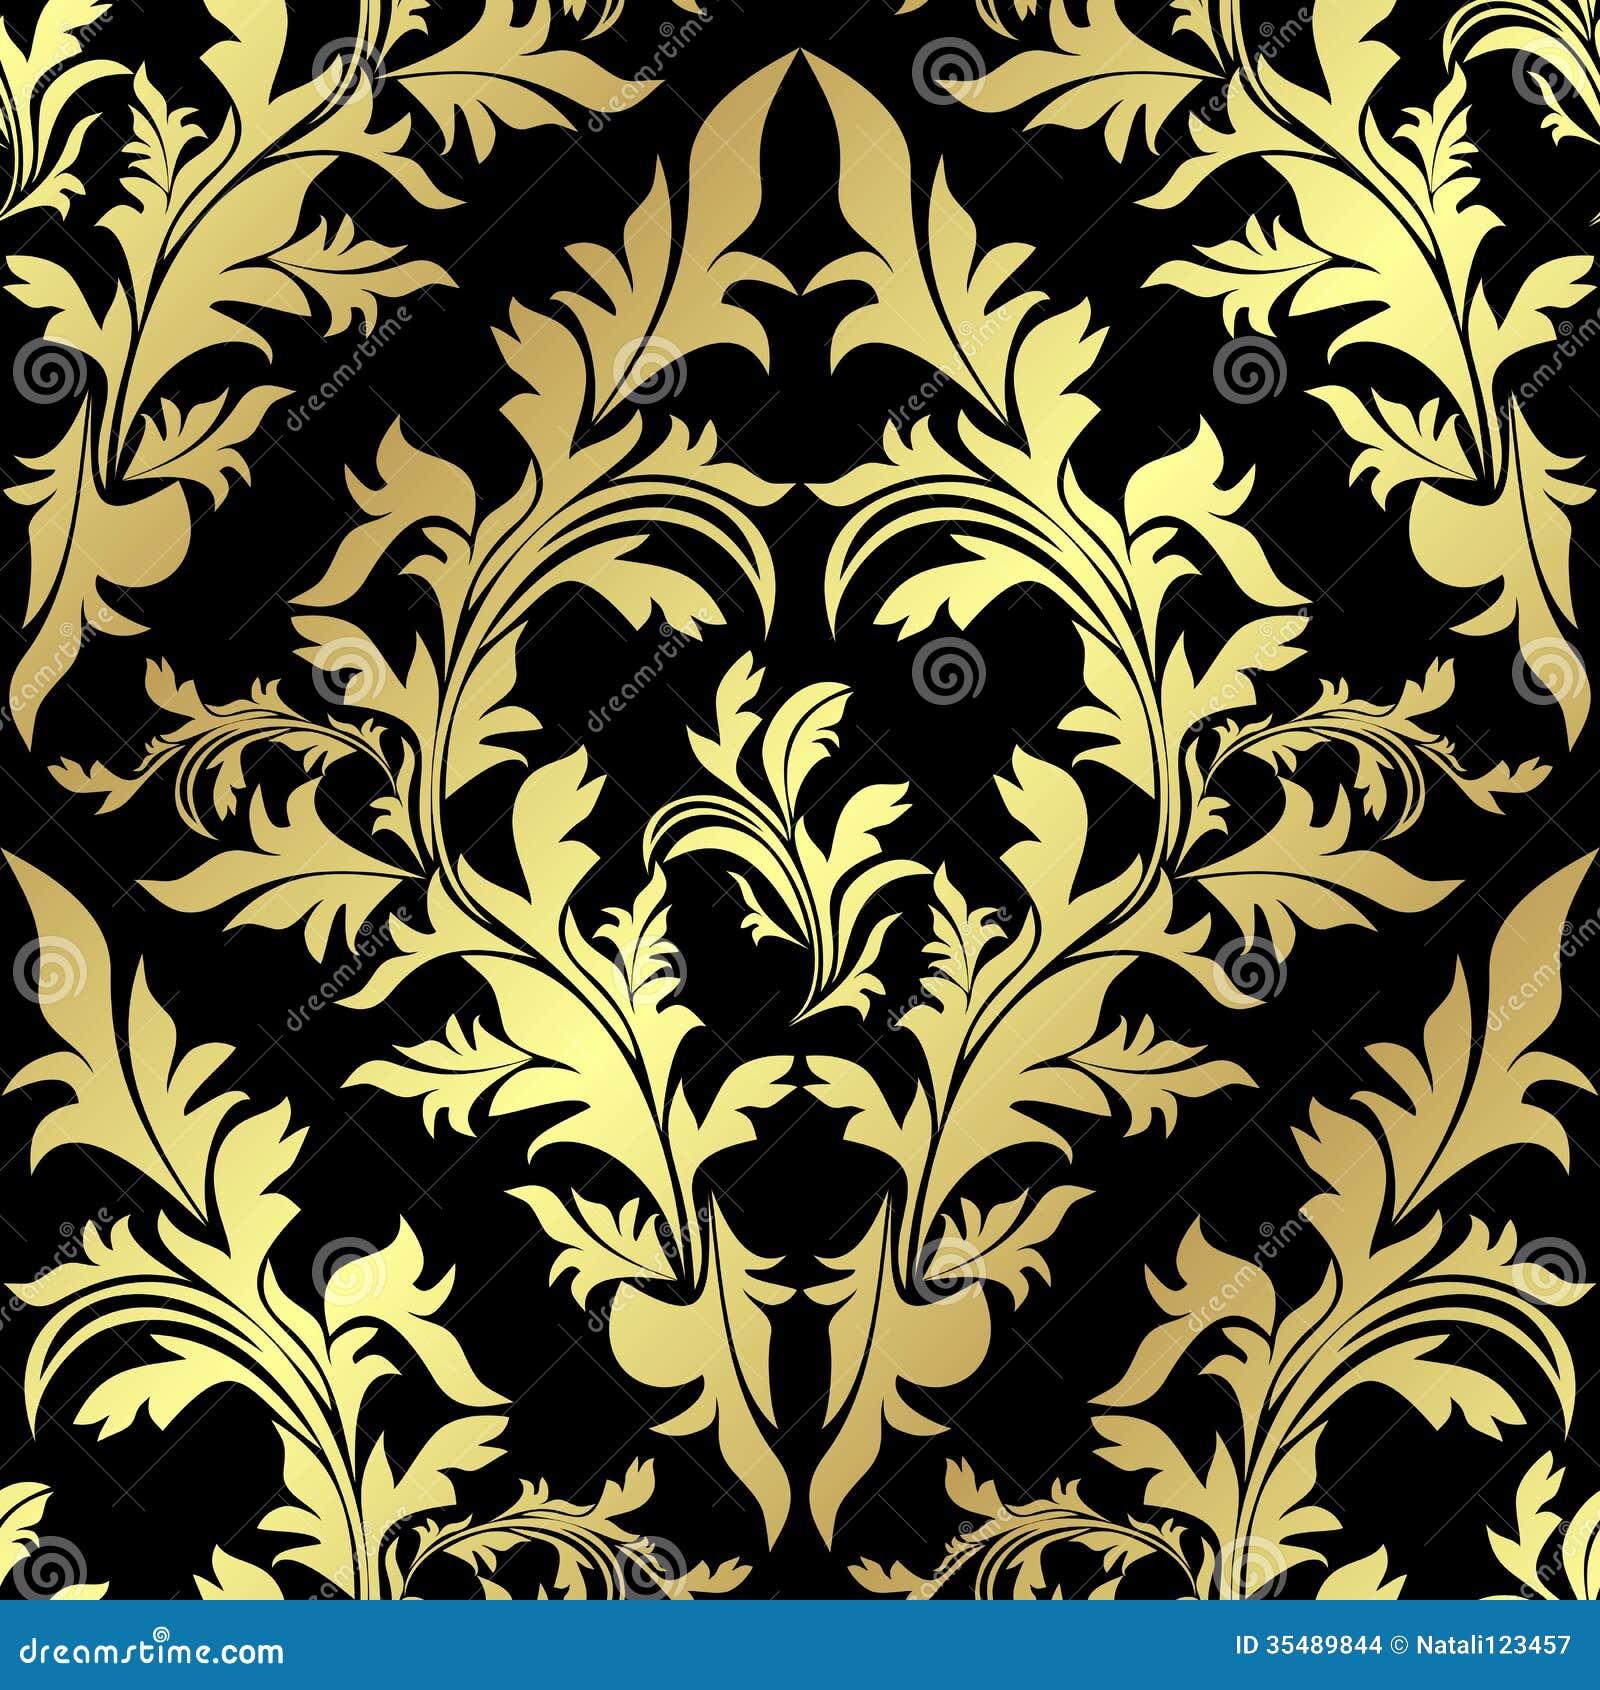 Nature Chandelier Golden Seamless Floral Pattern On Black Stock Images